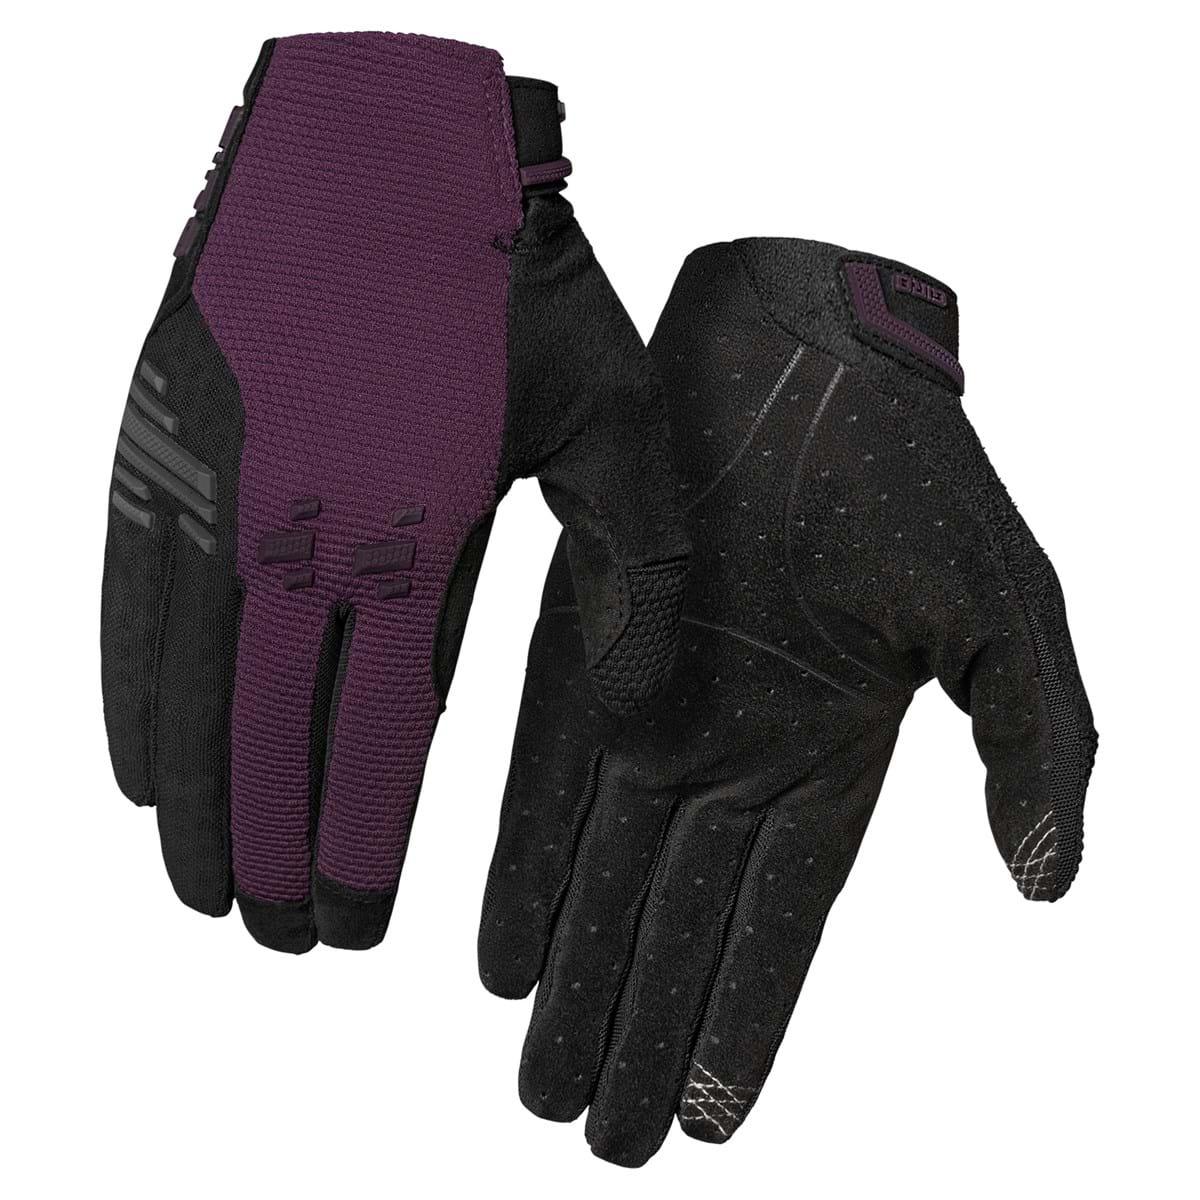 Havoc Women's Dirt Cycling Gloves